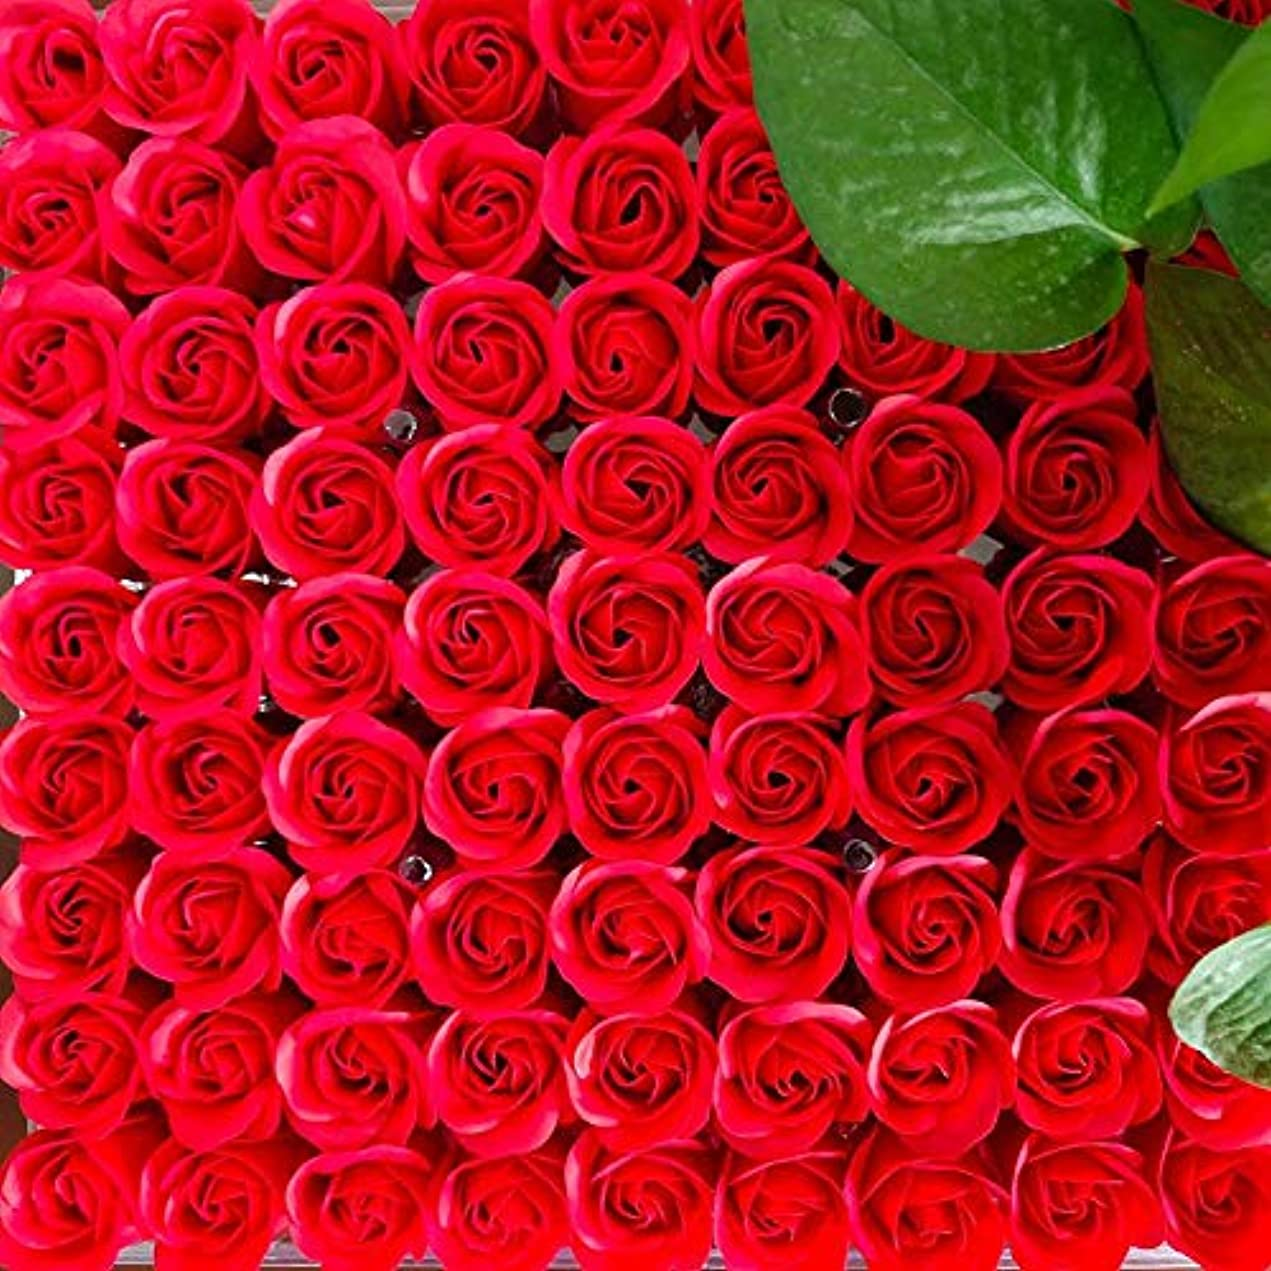 81PCS DIY ボディソープ バラ ローズ 洗濯用 フラワーソープ 良い香り 三層 贈り物 結婚披露宴 バレンタインデーギフト 石鹸の花+ボックス